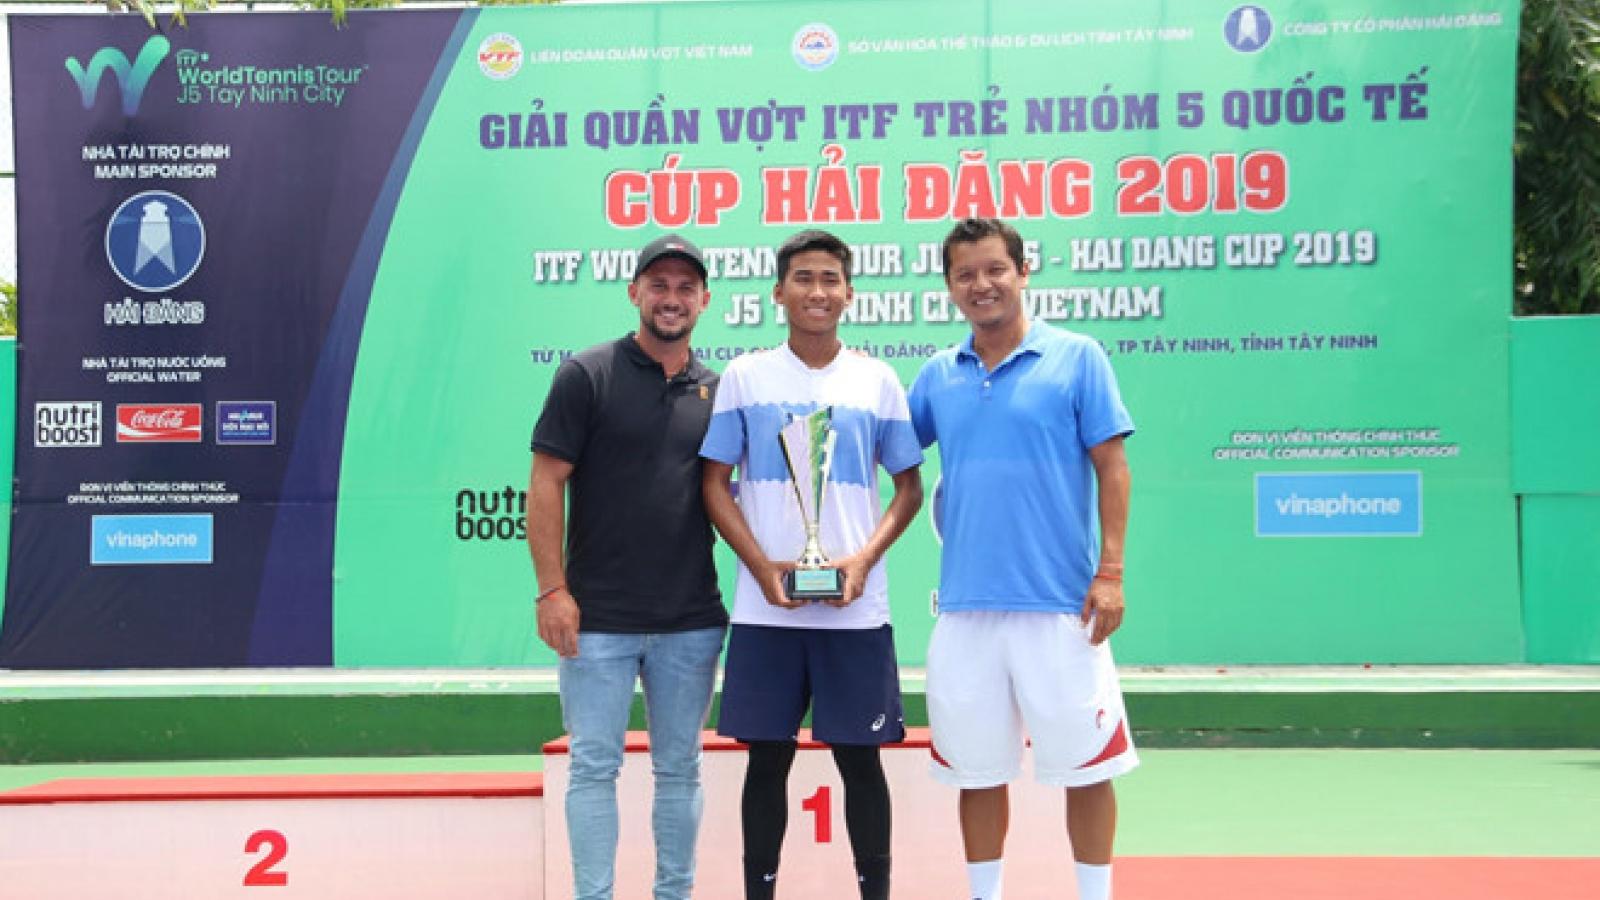 Peruvian coach named manager of Vietnamese tennis team